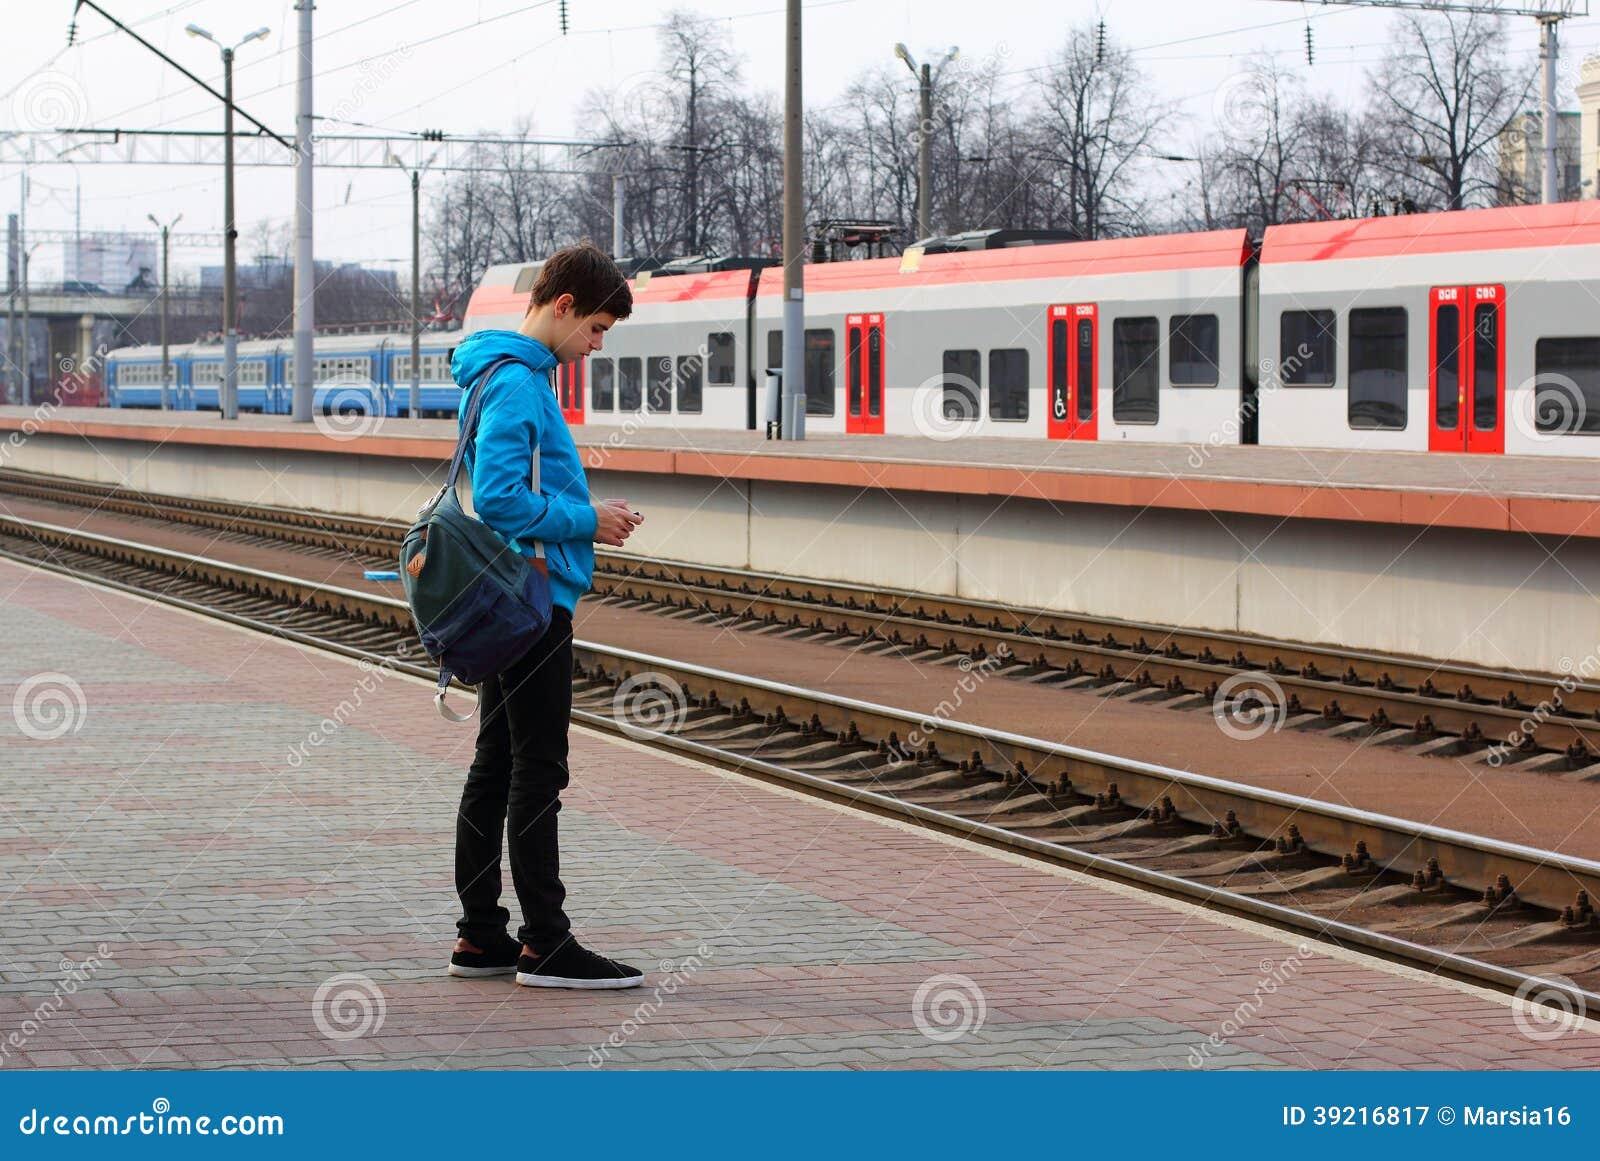 Viajero del adolescente